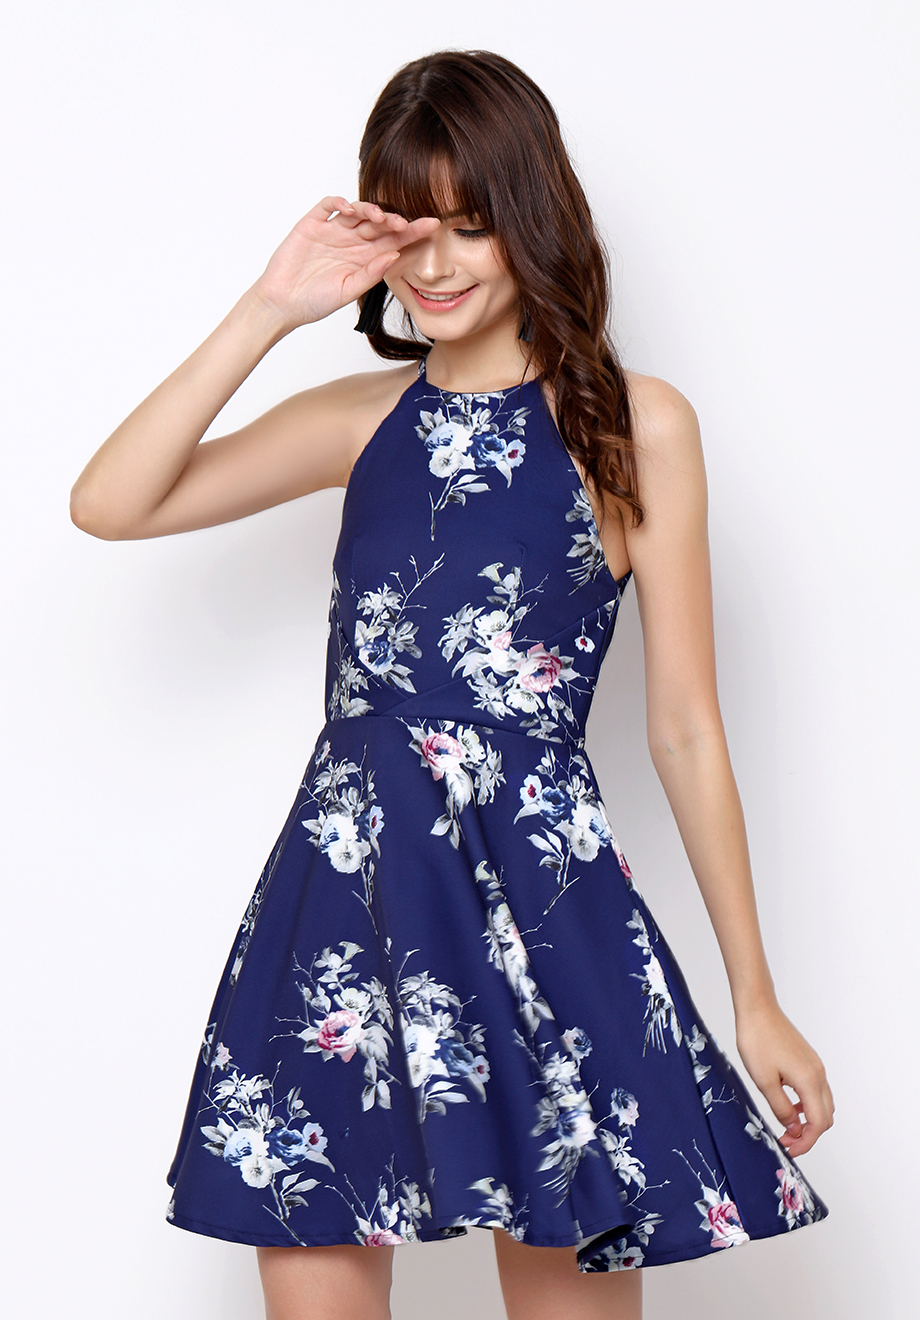 Chocochips Boutique Marino Dress Blue Quick View